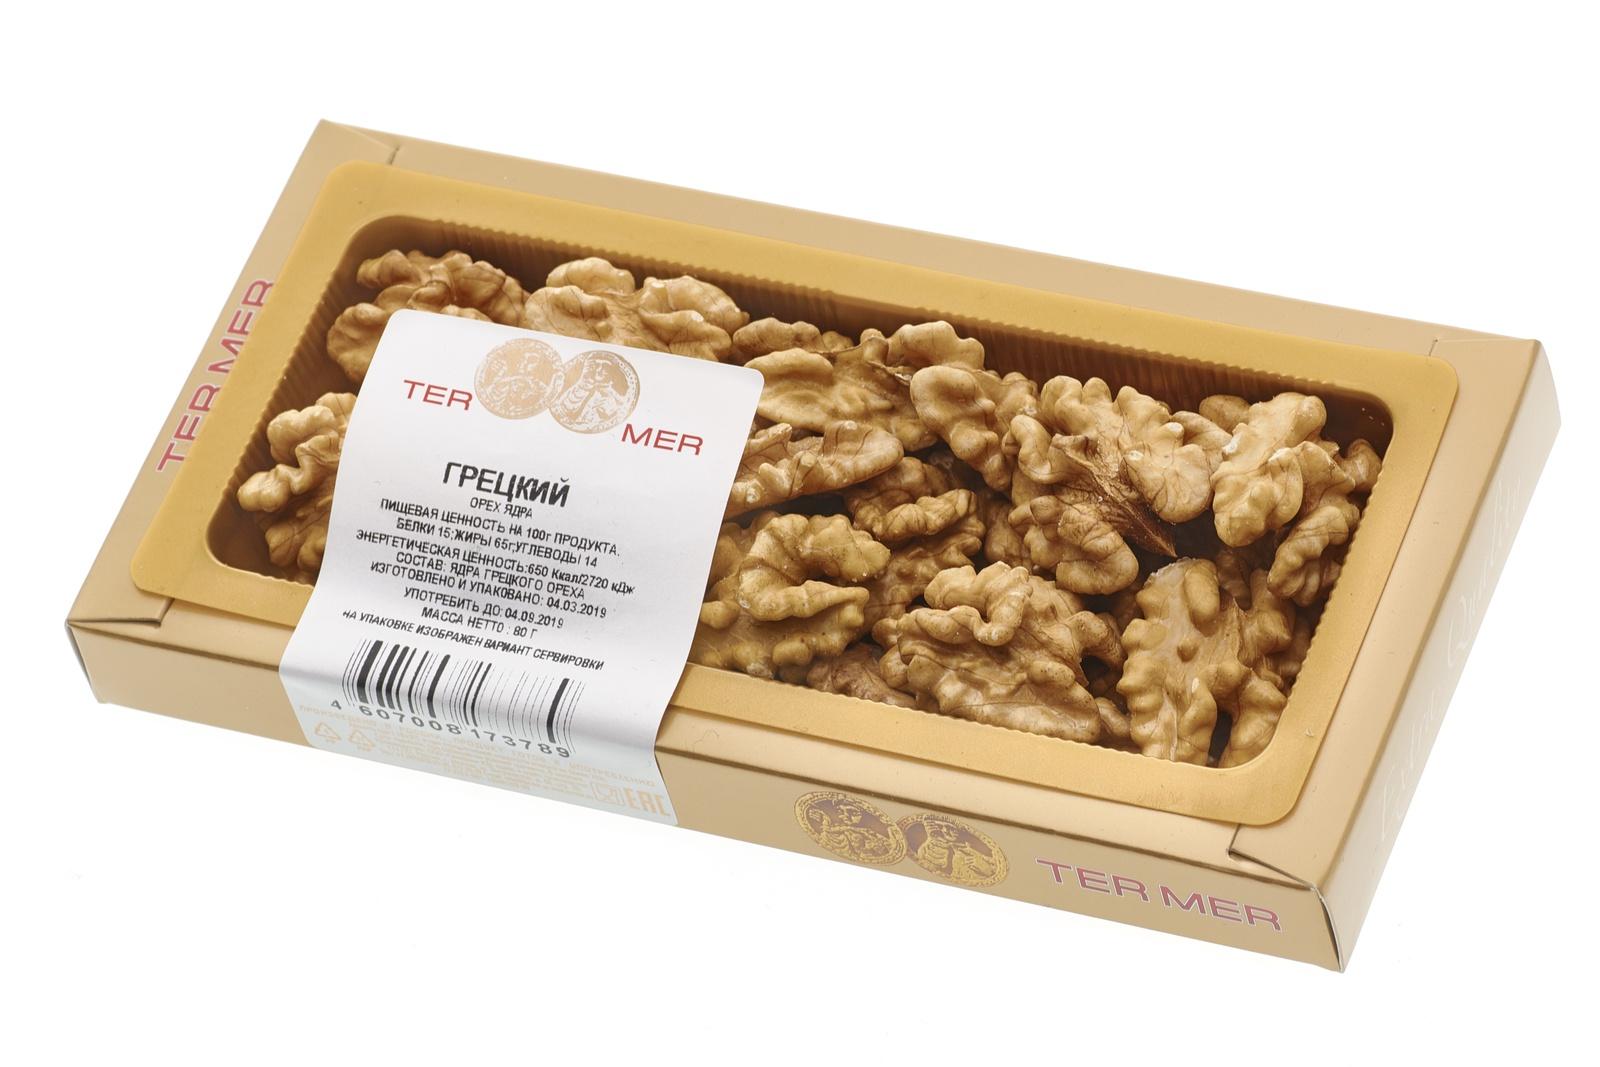 Грецкий орех ядра (чилийский), 80 г цена в Москве и Питере